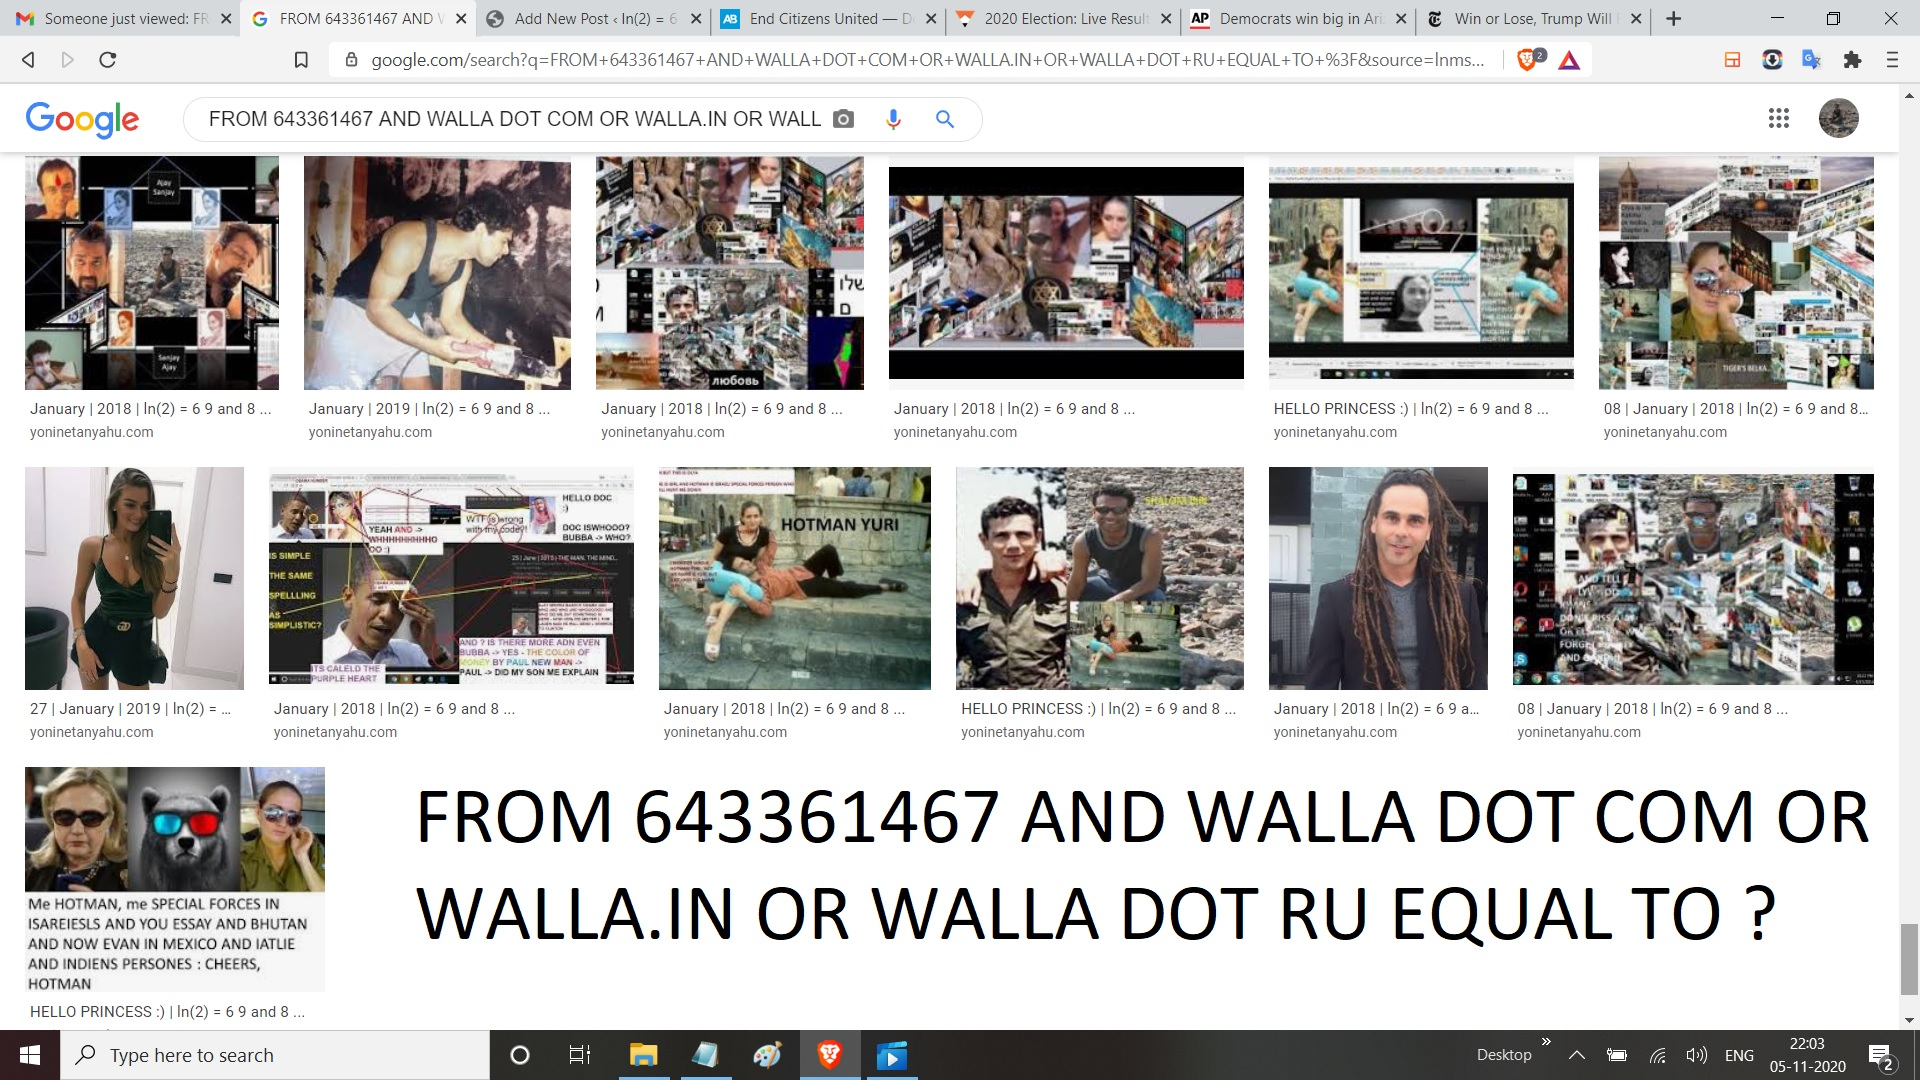 FROM 643361467 AND WALLA DOT COM OR WALLA.IN OR WALLA DOT RU EQUAL TO